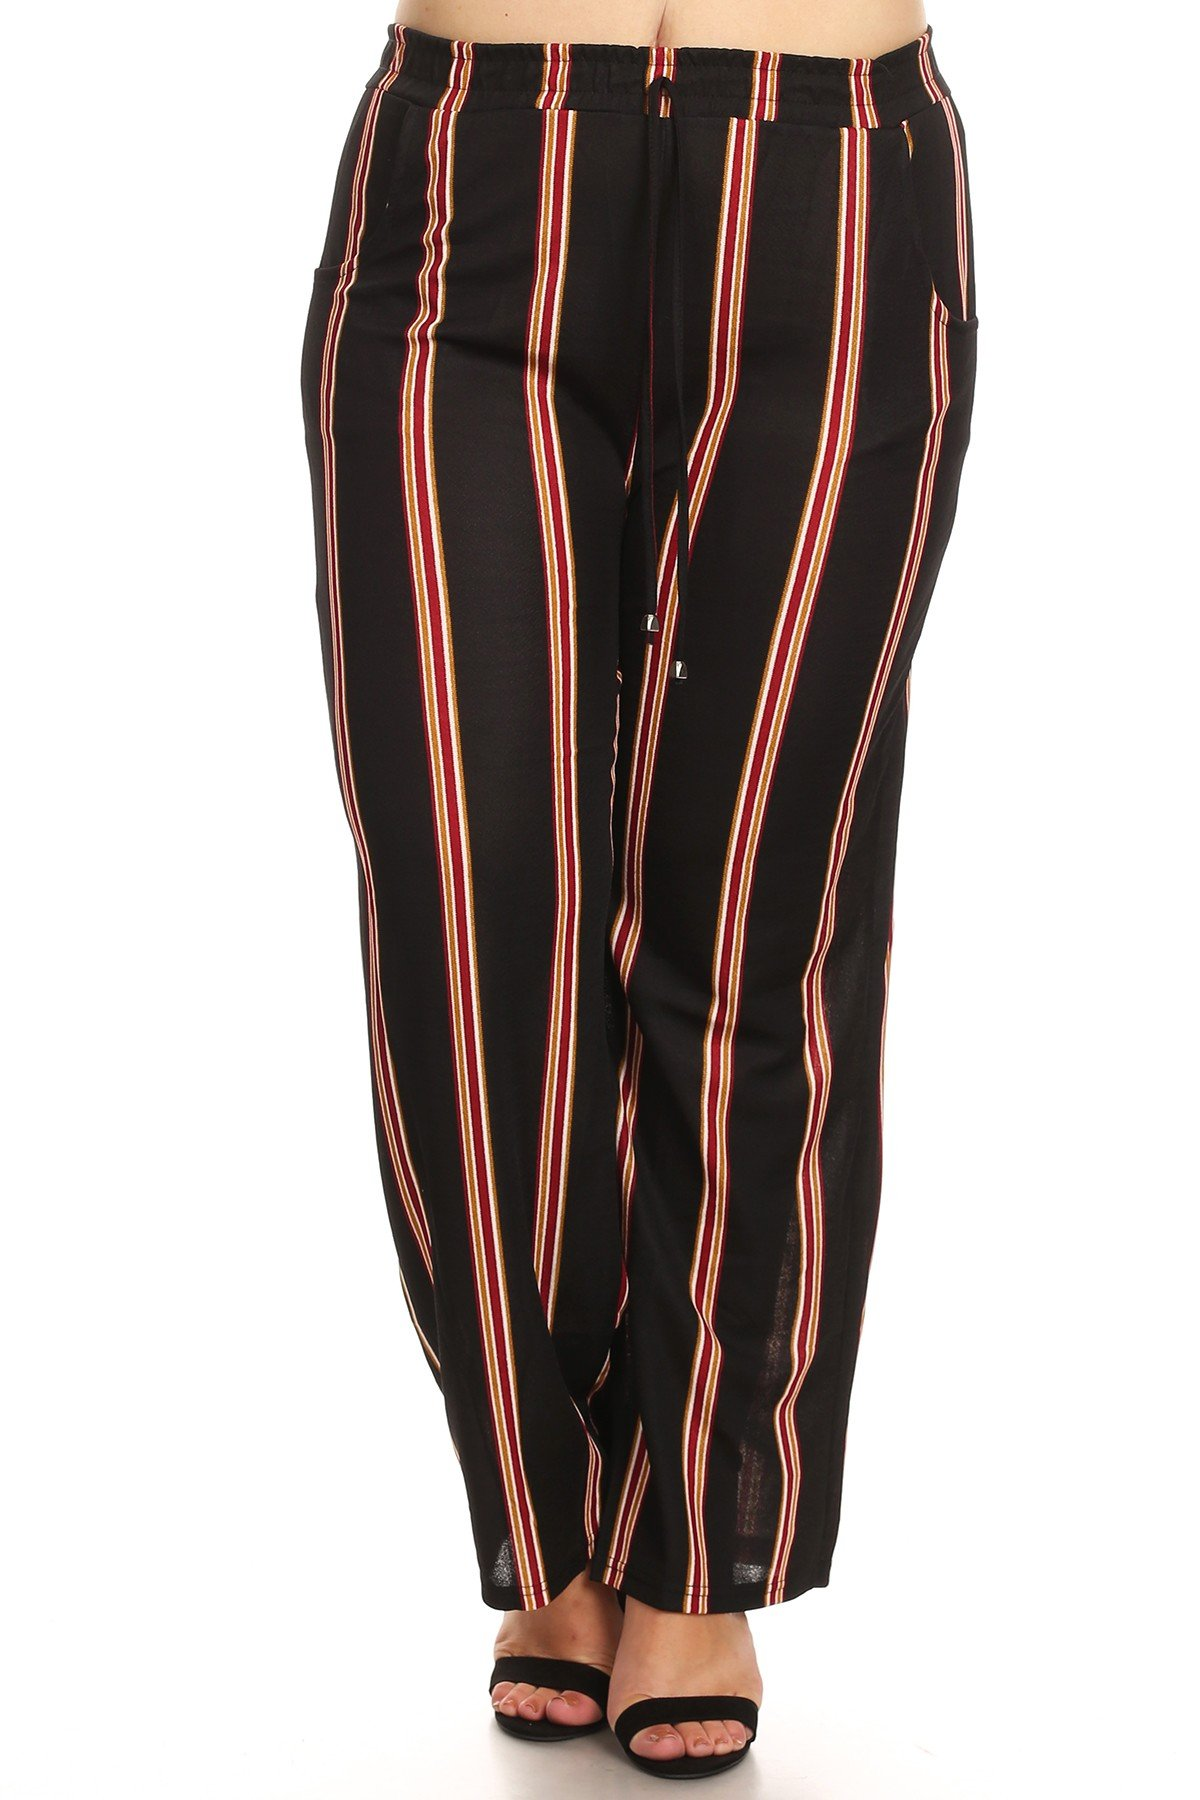 New Mix Women's Plus Size Black and White High Waist Wide Leg Pants (2X/3X)